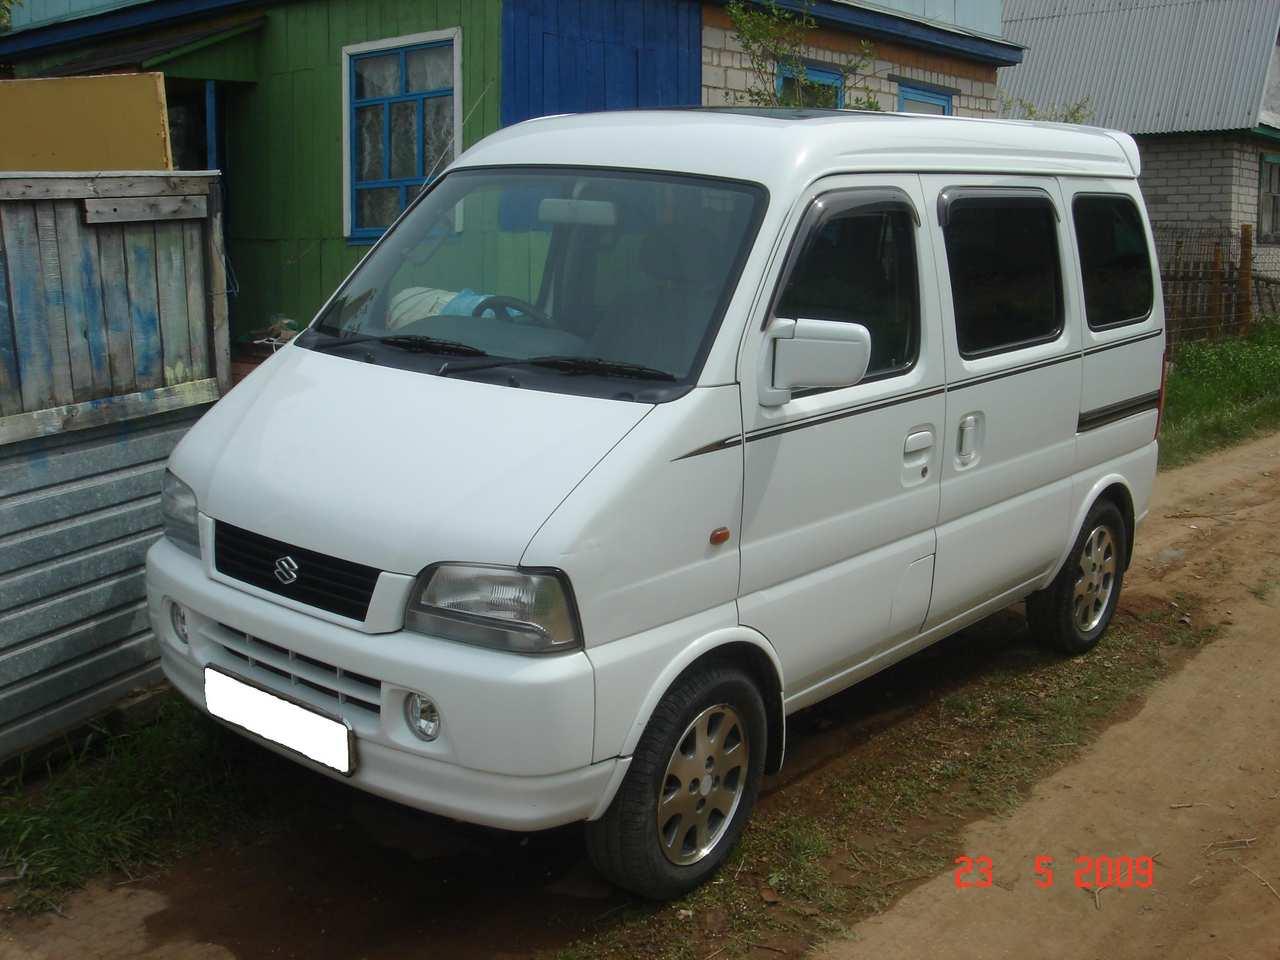 Used 2000 Suzuki Every PLUS s 1300cc Gasoline FR